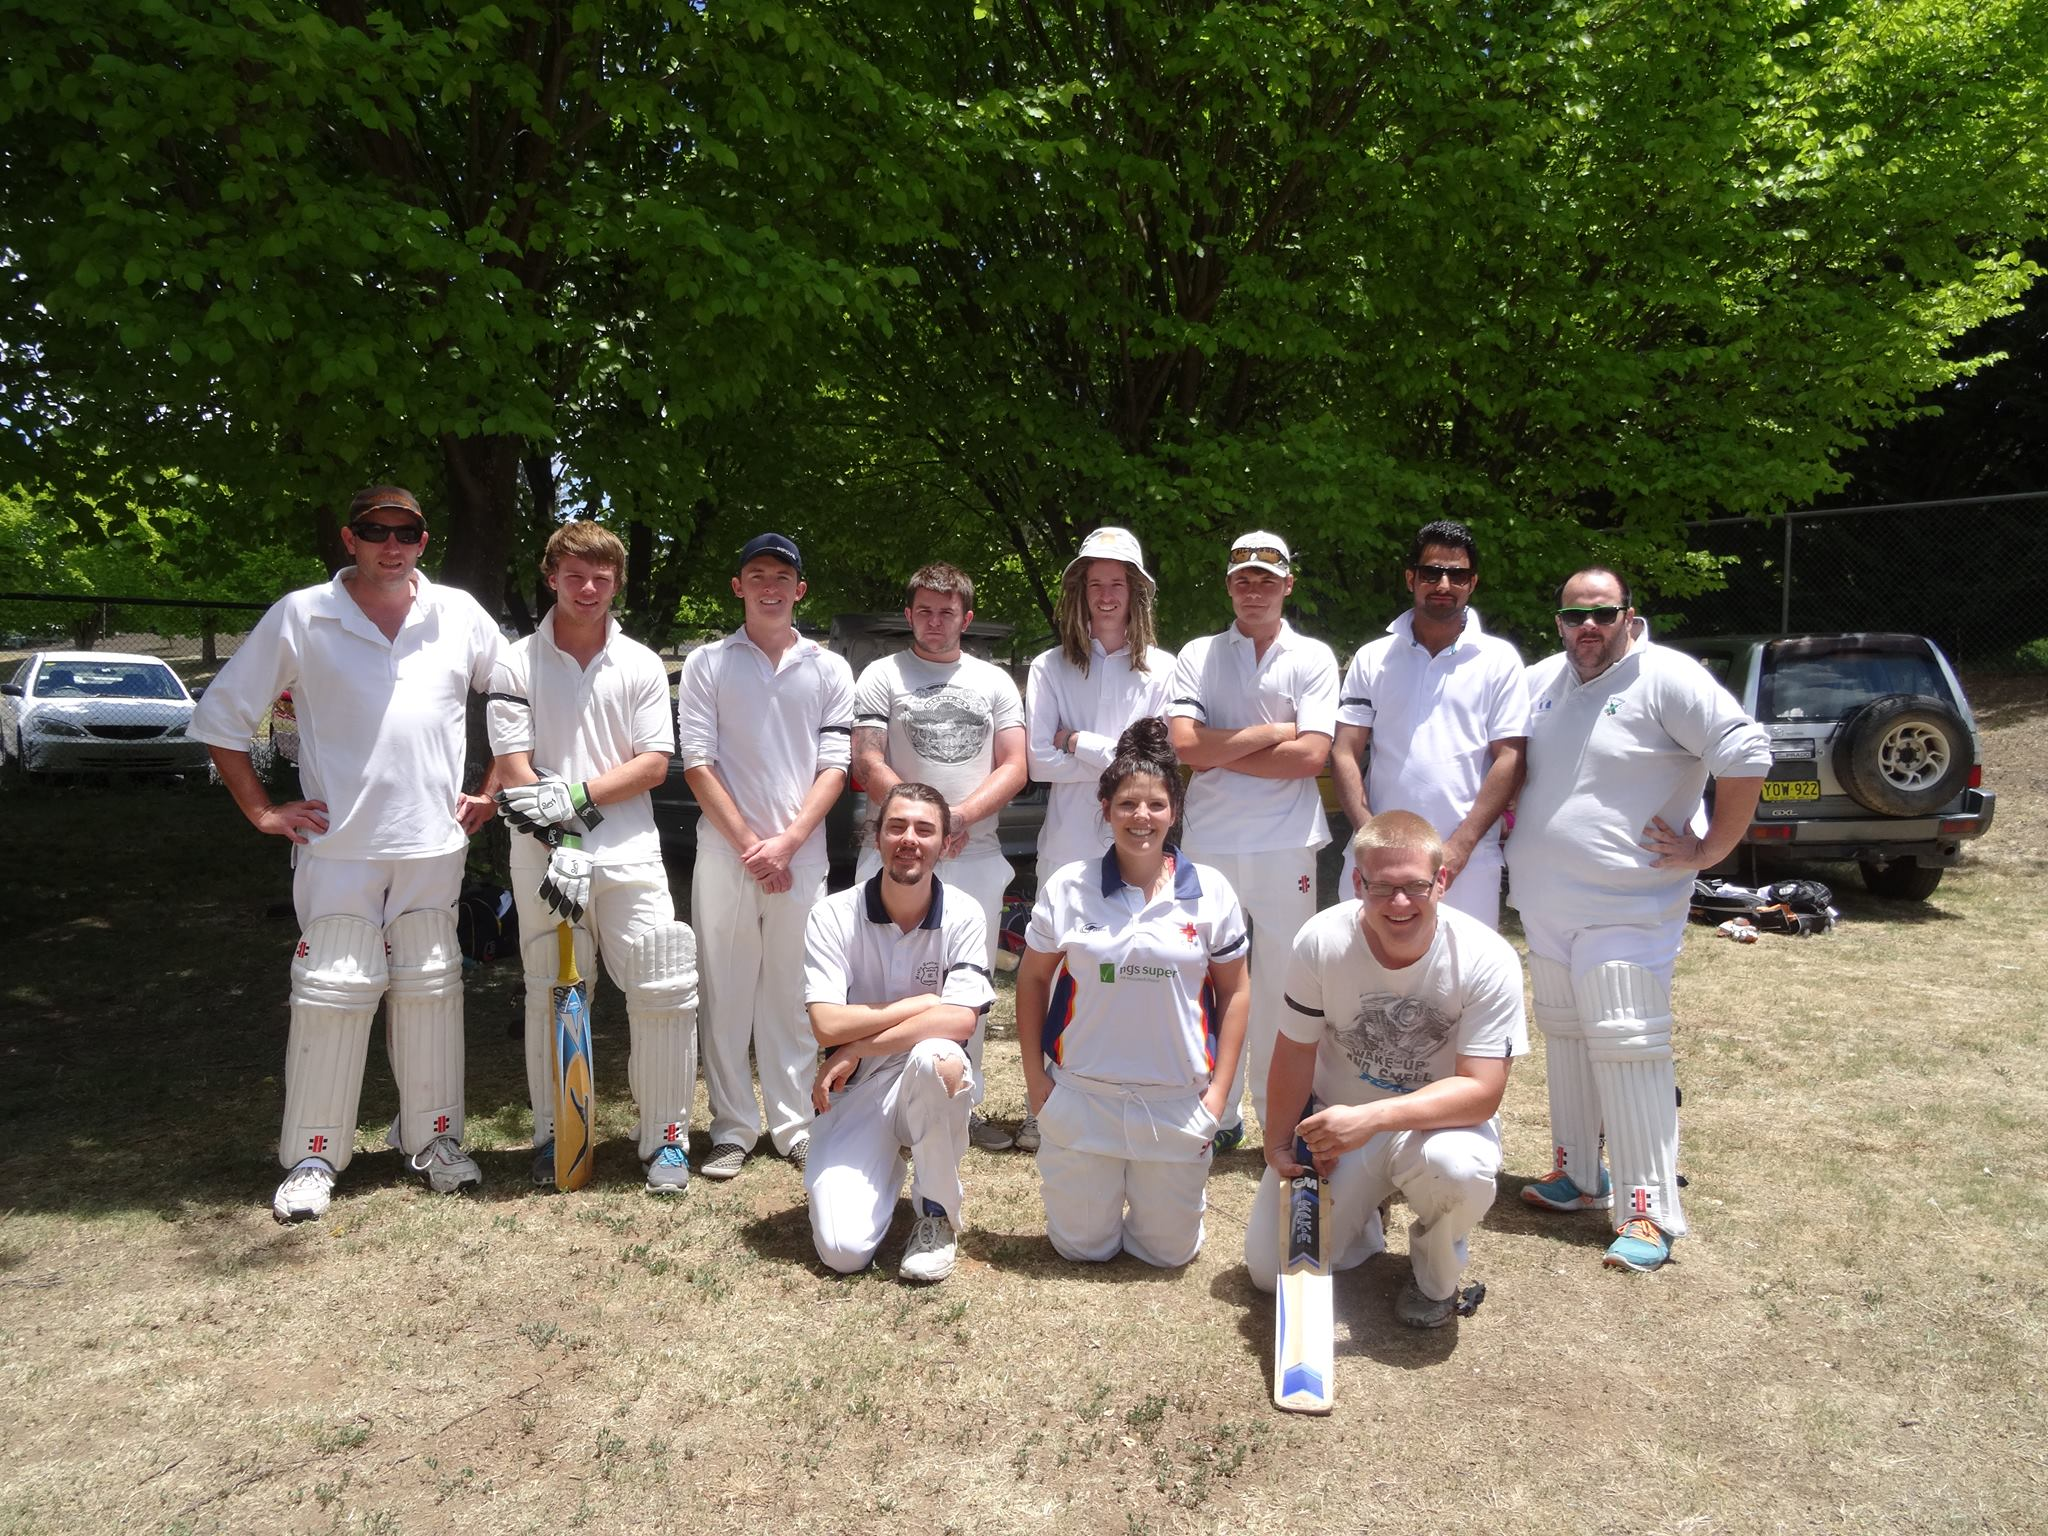 Uralla United Cricket Club